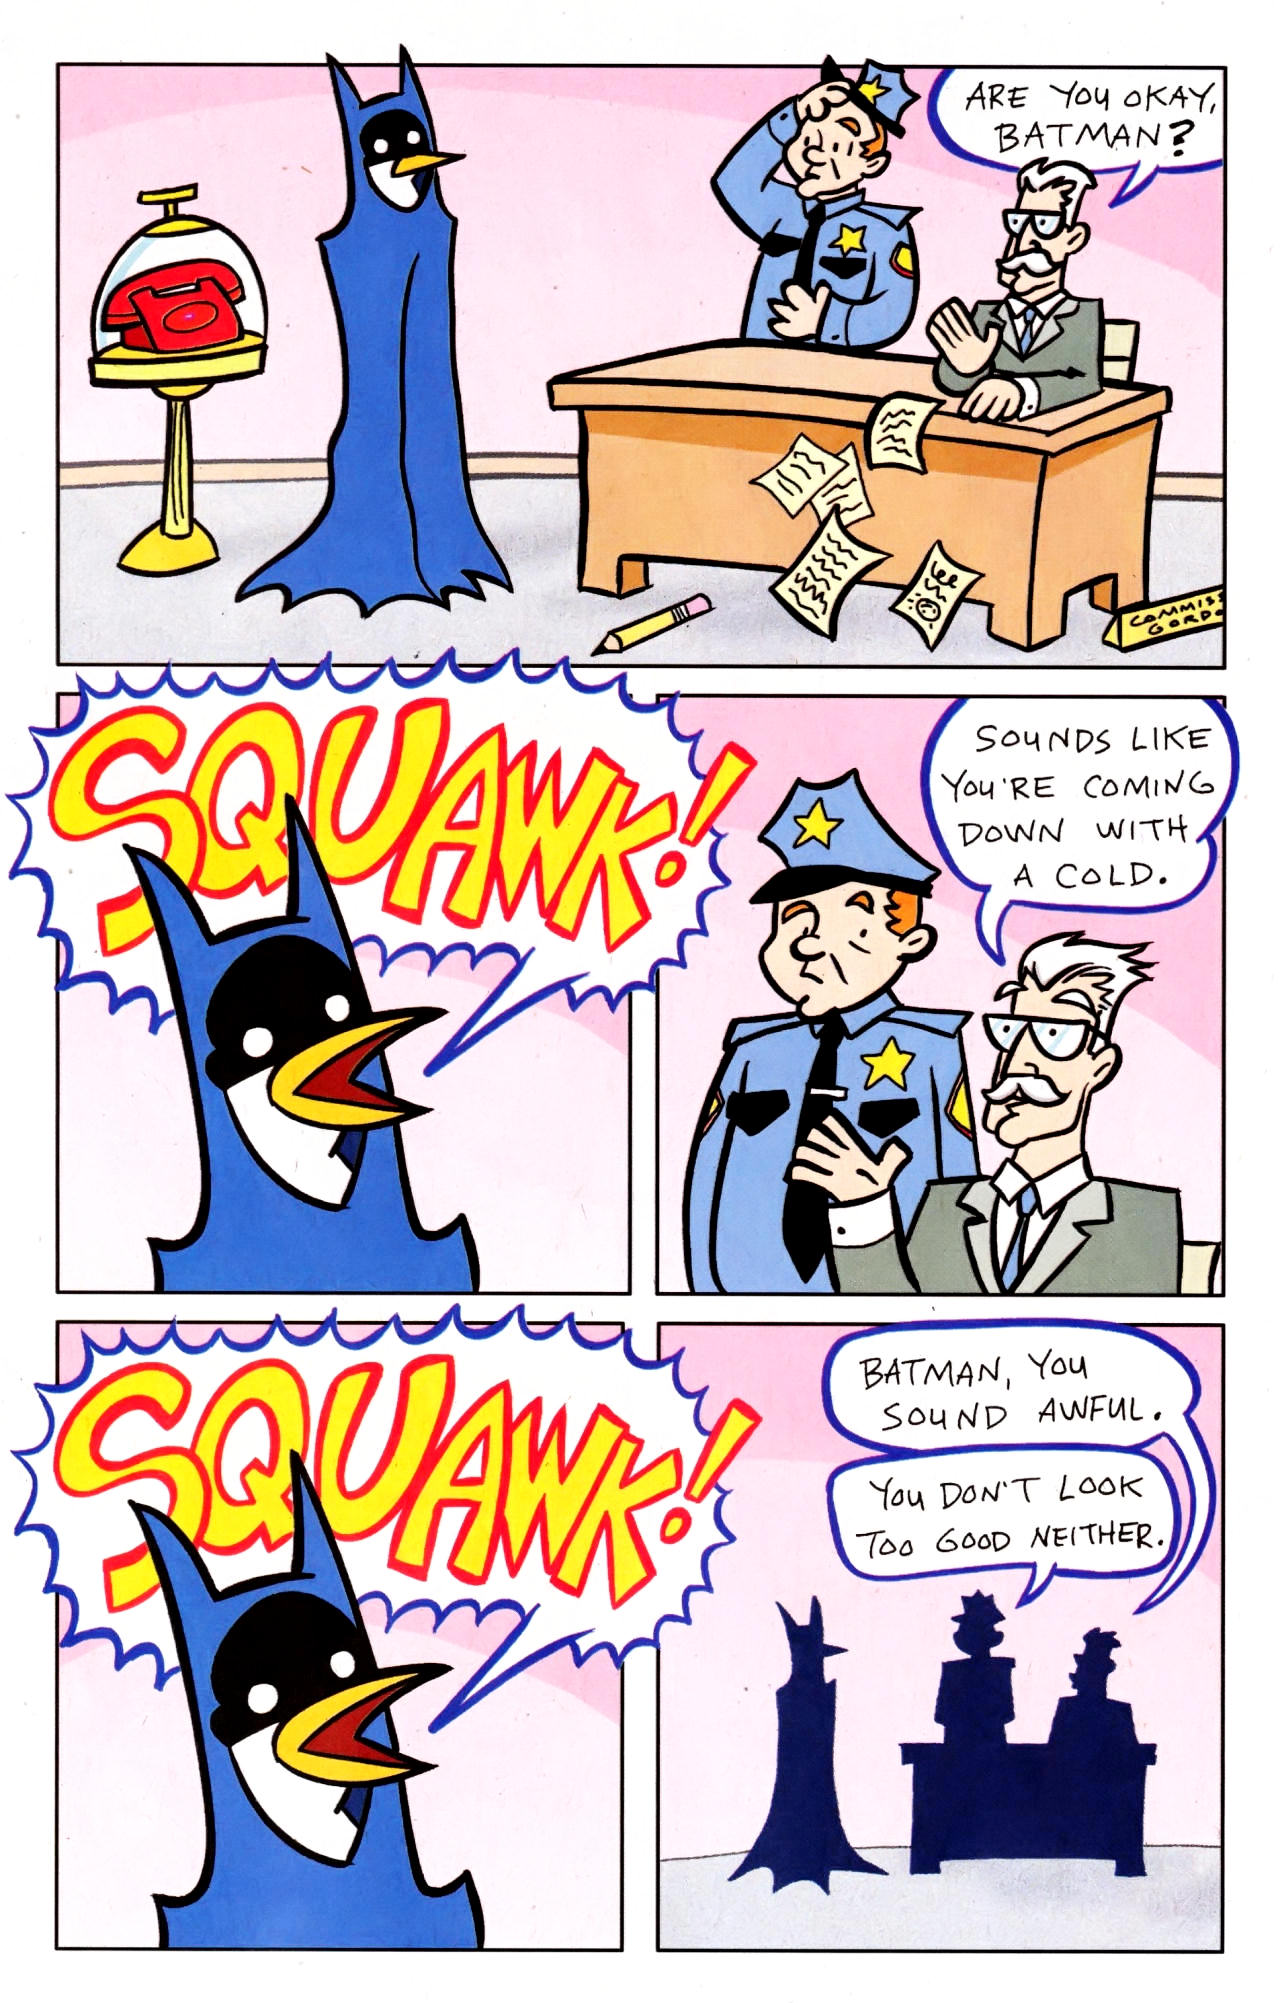 Tiny Titans #5 pg 23